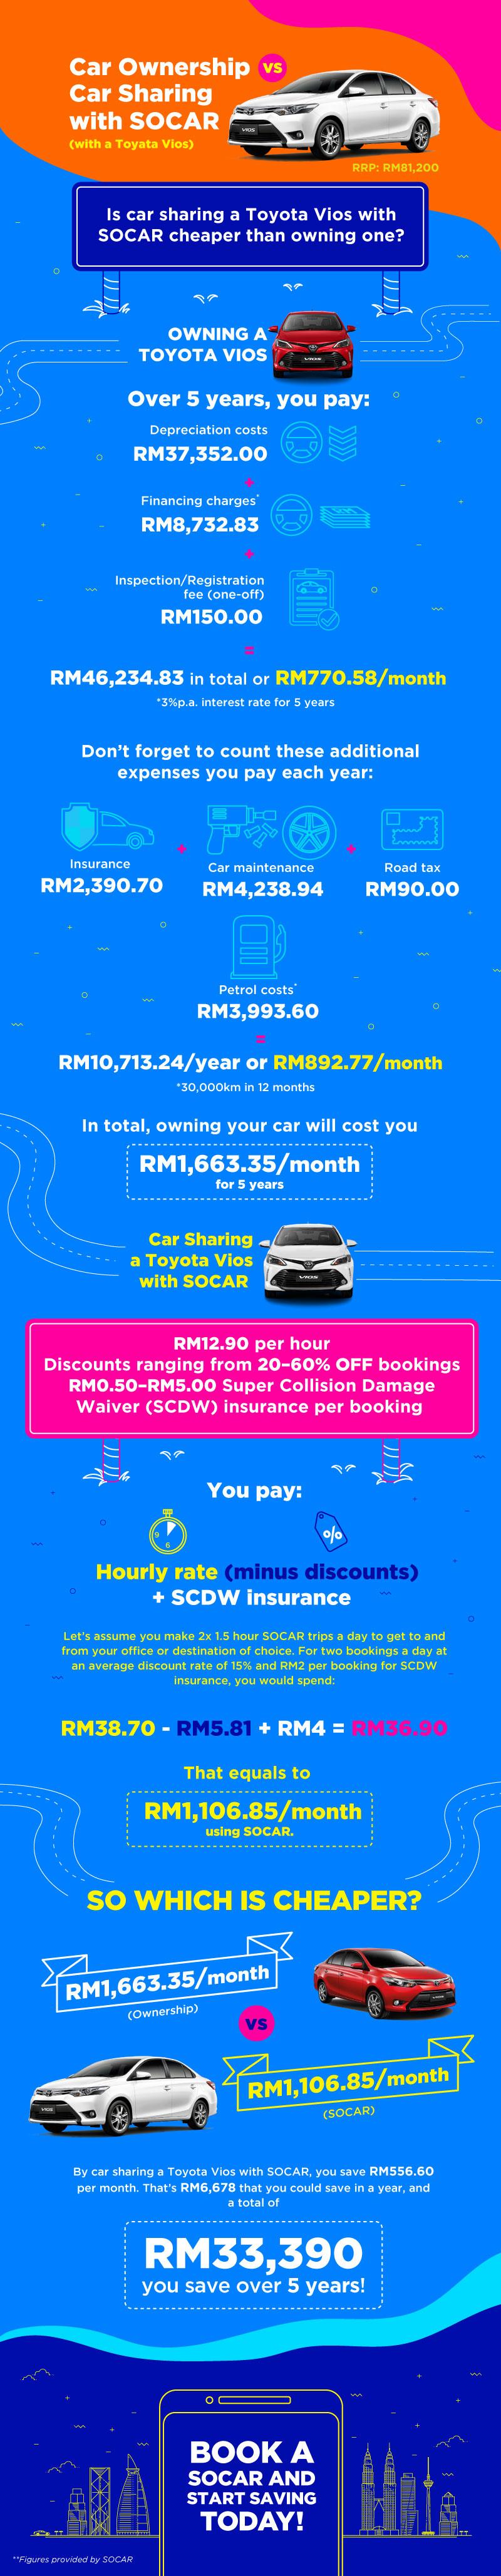 SOCAR car ownership vs car sharing toyota vios infographic